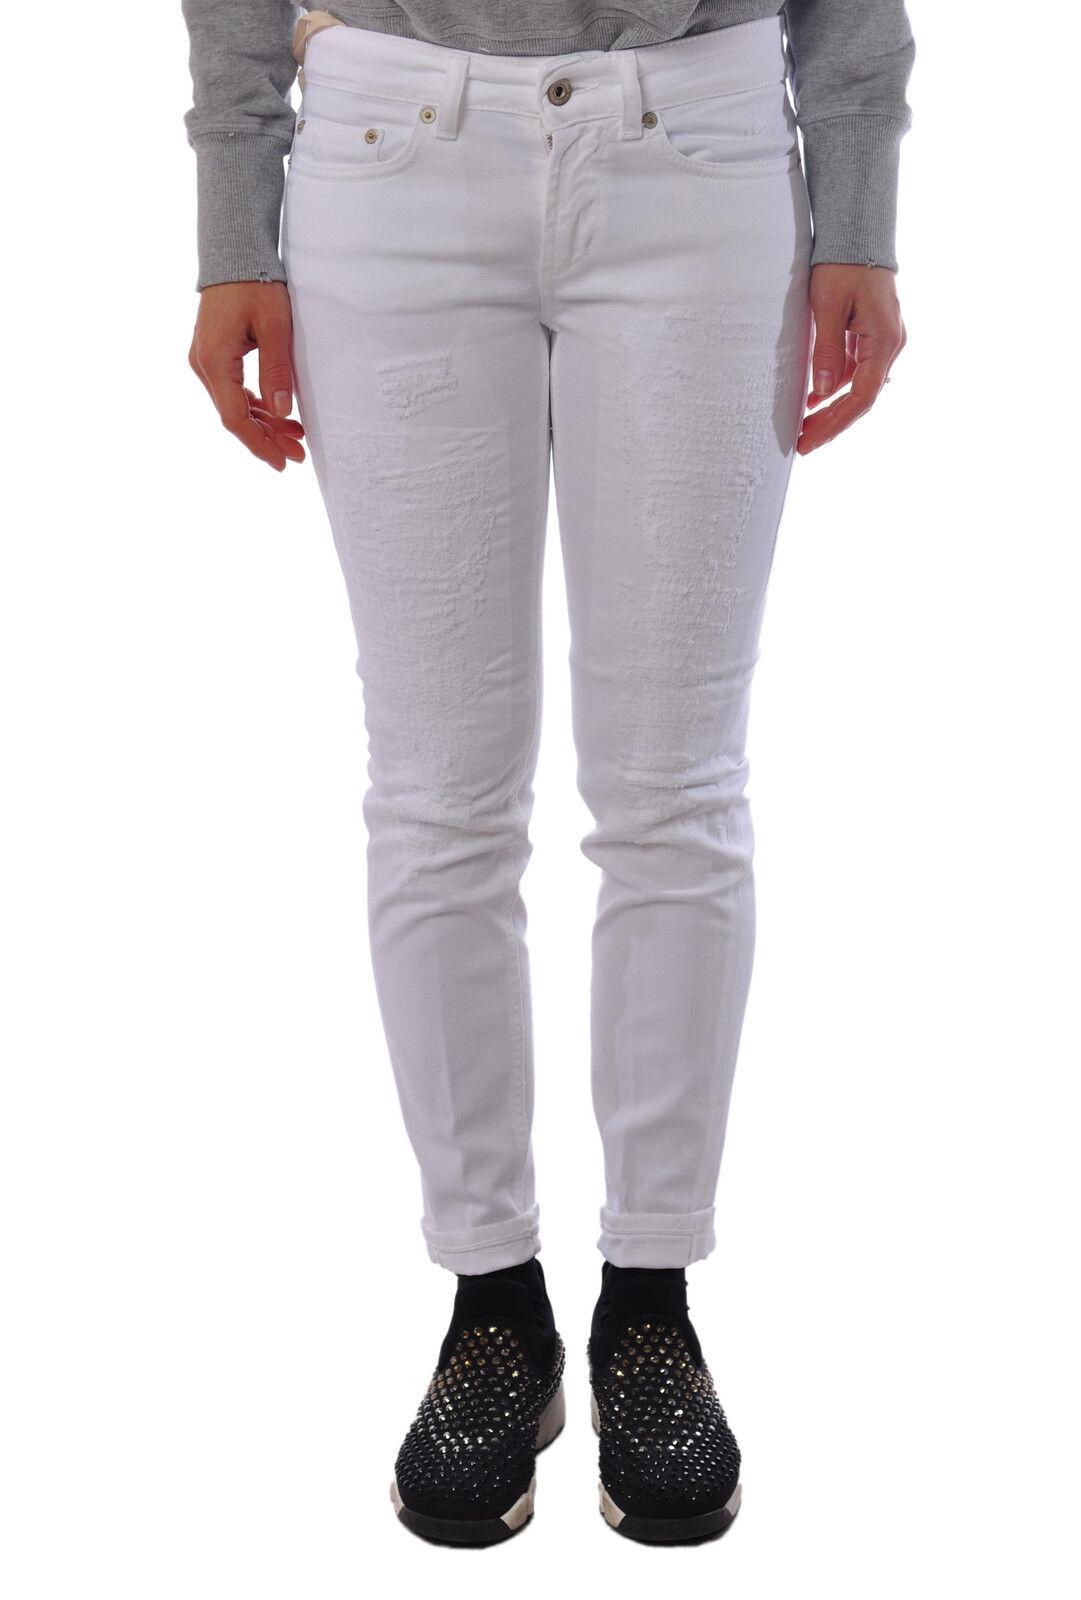 Dondup  -  Pants - Female - 26 - White - 1325704B160732